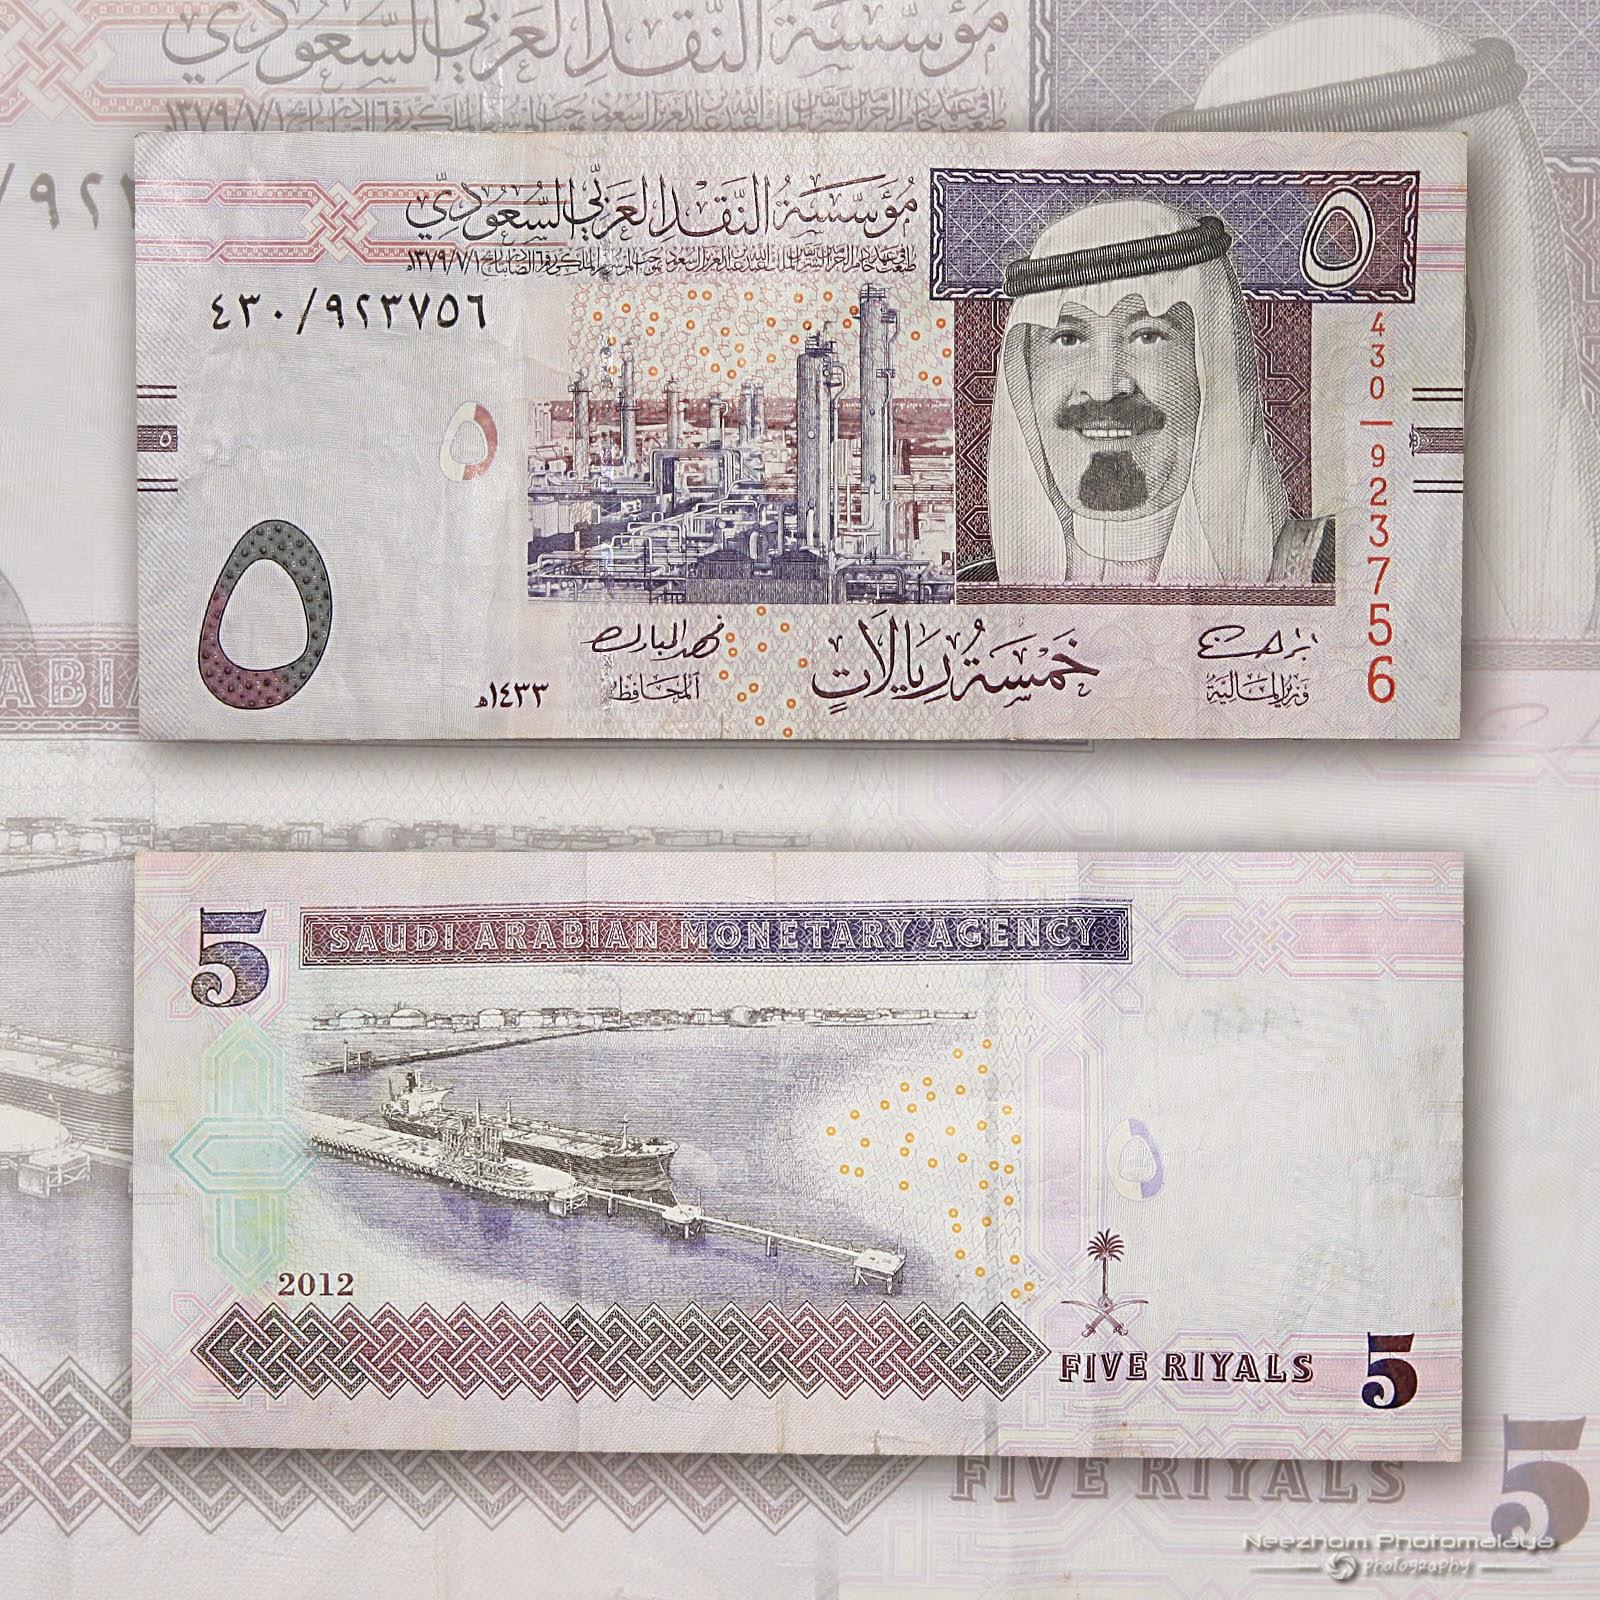 Saudi Arabia 5 Riyals 2012 banknote